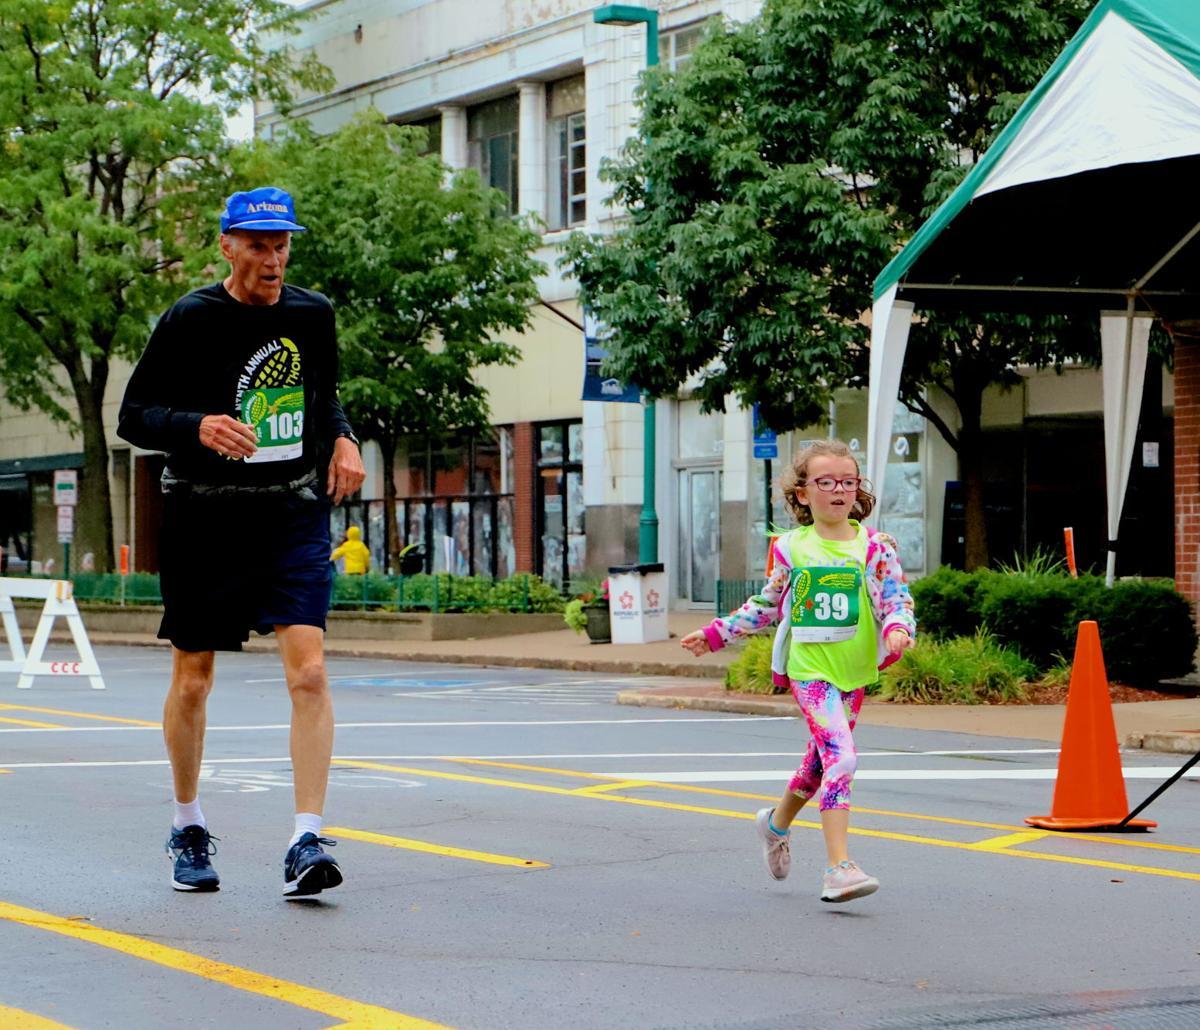 Roger Rieke, 71, and Reese Detoye, 7, finish the 5K